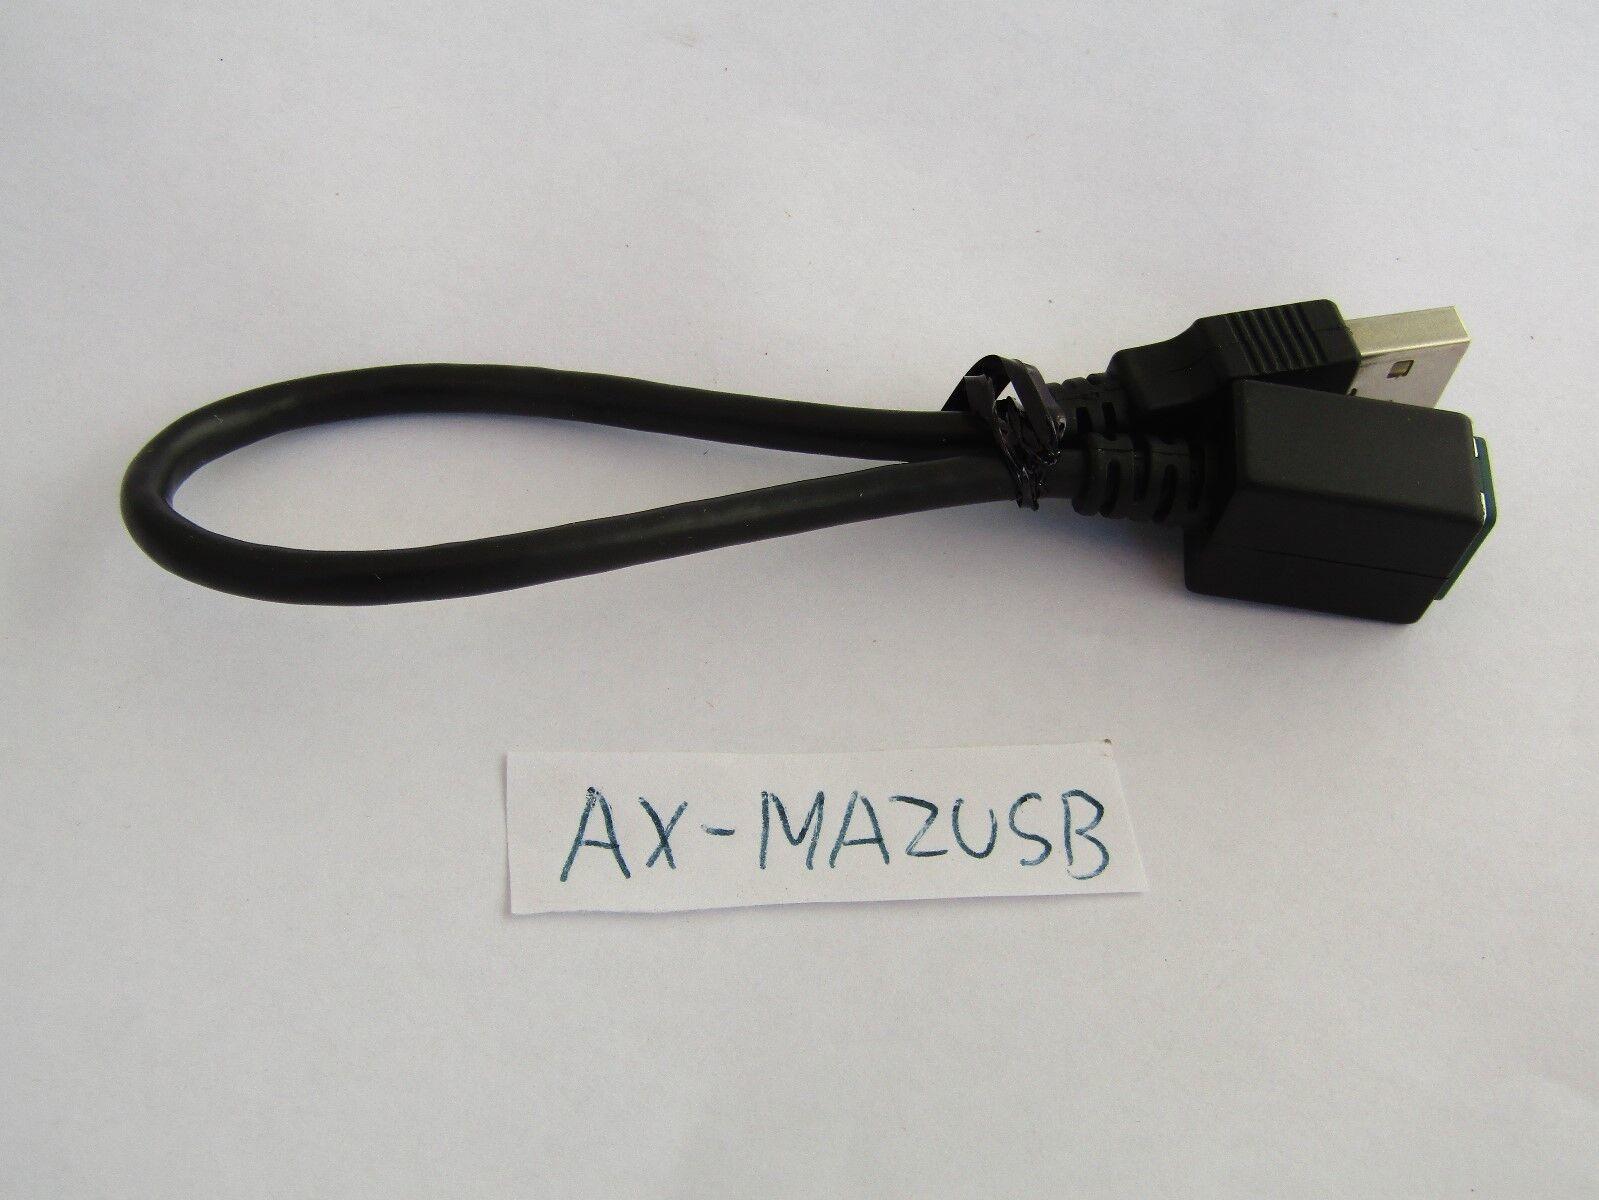 Axxess Ax Mazusb Usb Adapter For Mazda 2013 Up Ebay Wiring Harness Connectors 2008 Nissan Rogue